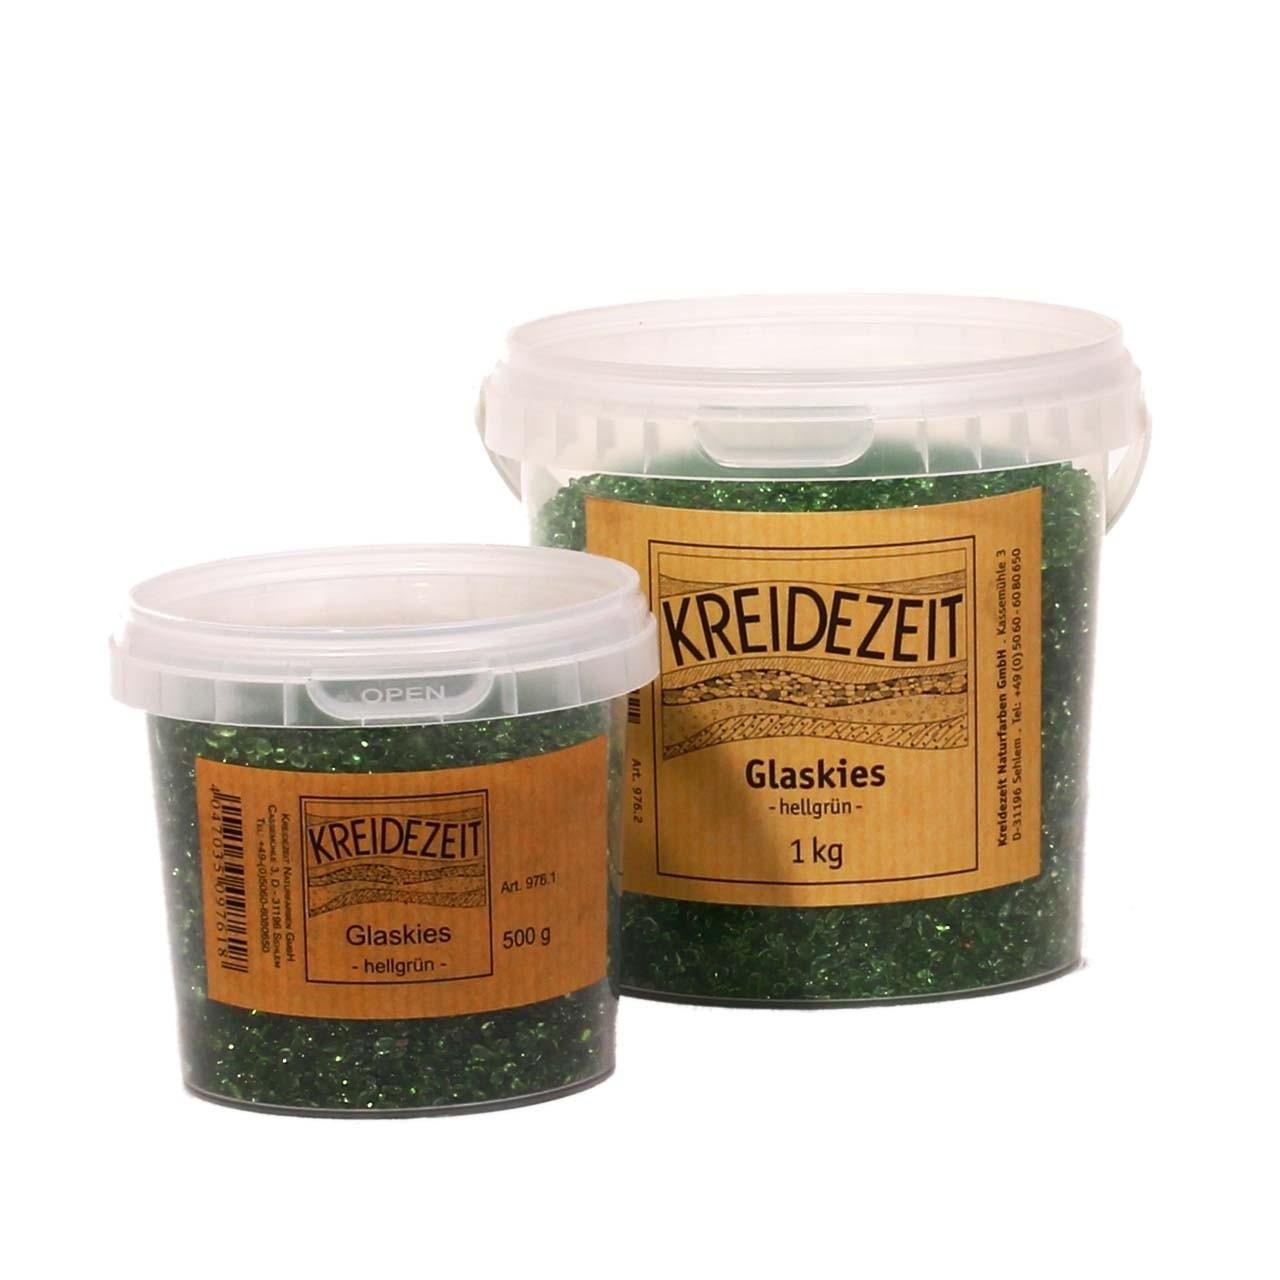 Kreidezeit Glaskies hellgrün 1 kg